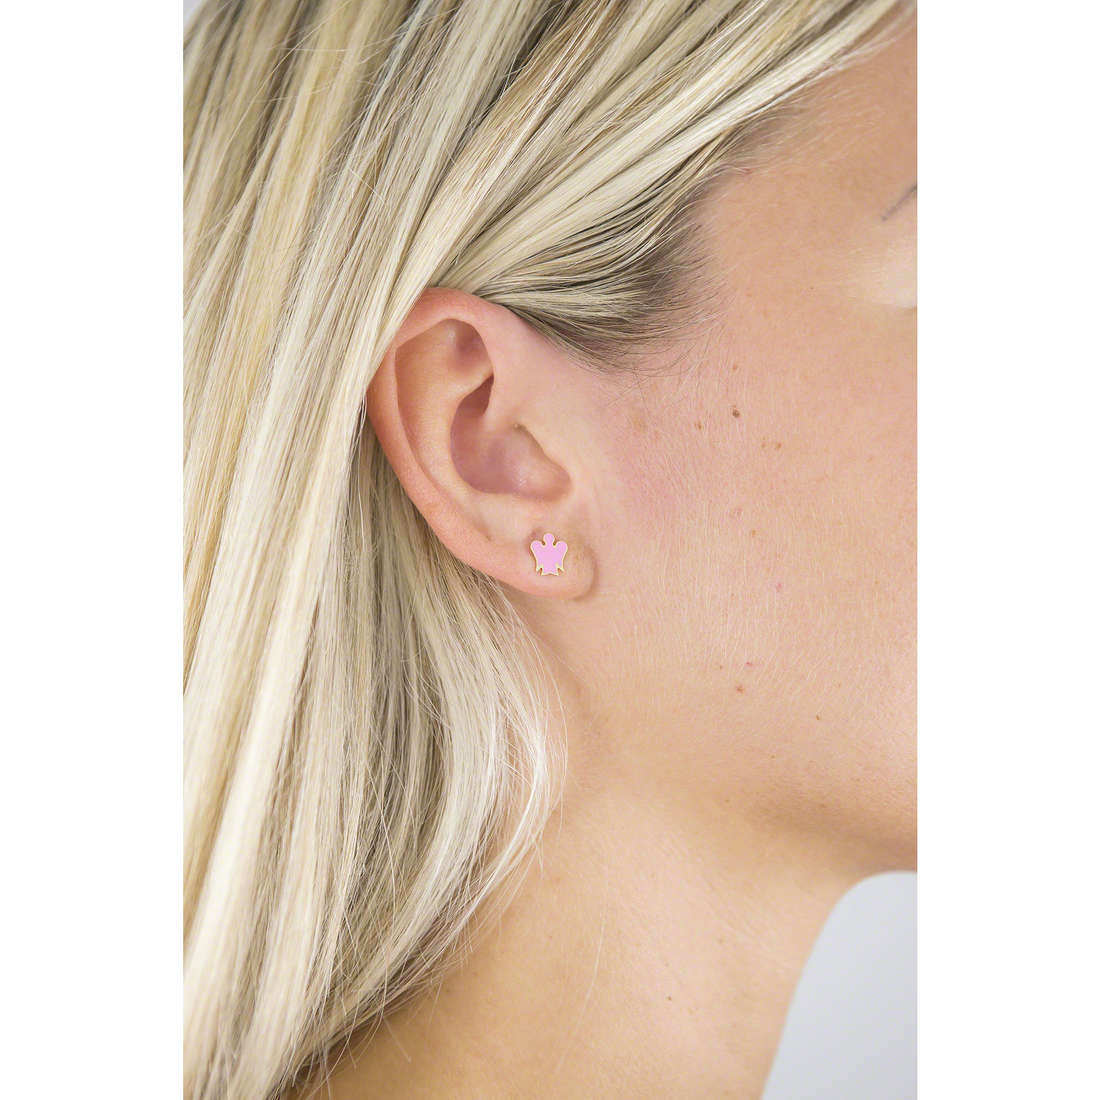 Giannotti orecchini Angeli donna NKT209 indosso